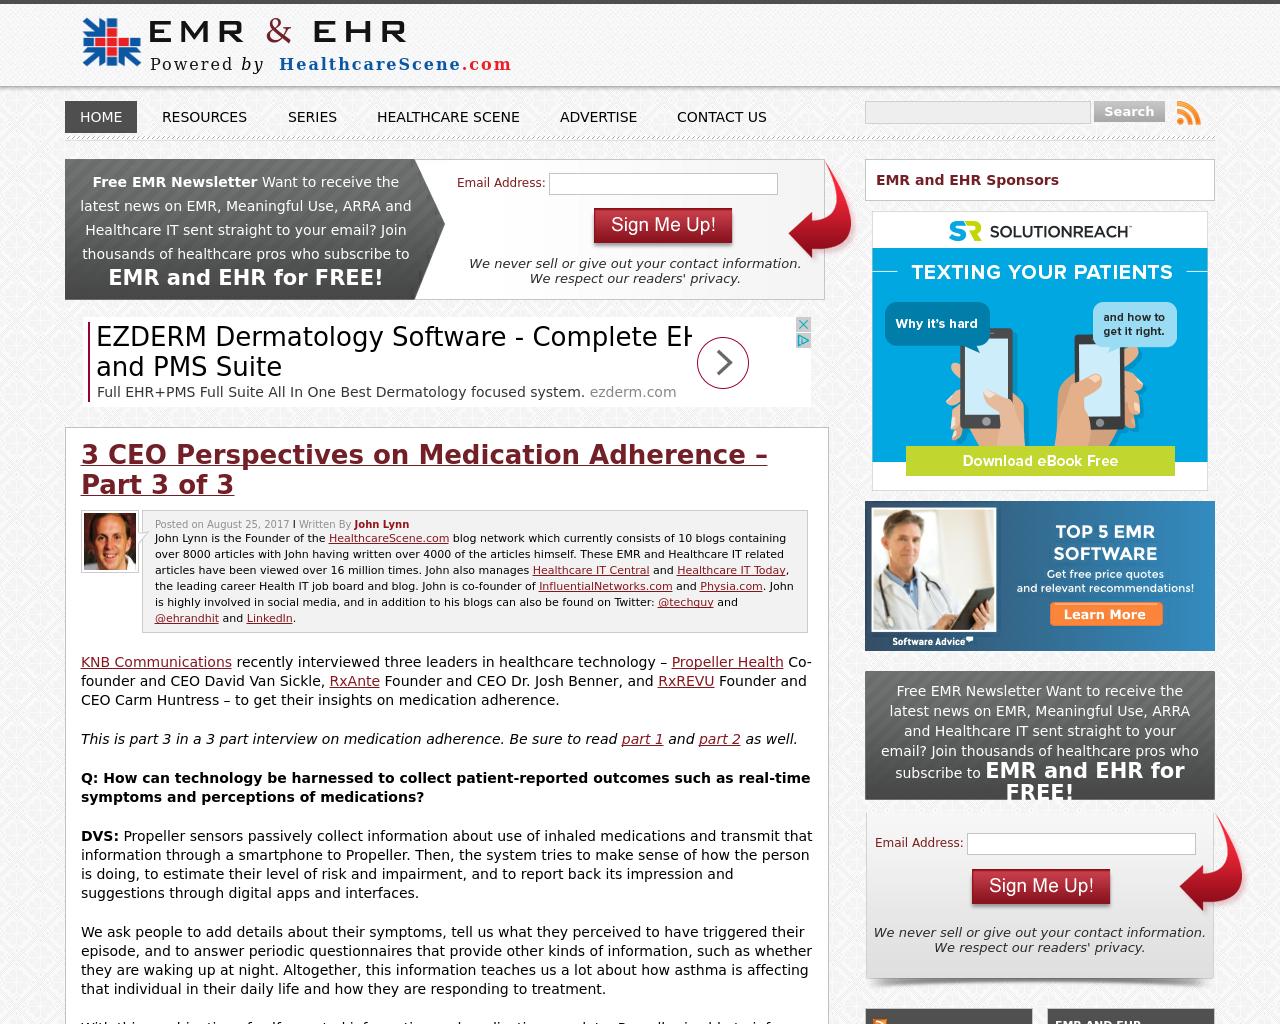 EMR-&-EHR-Advertising-Reviews-Pricing